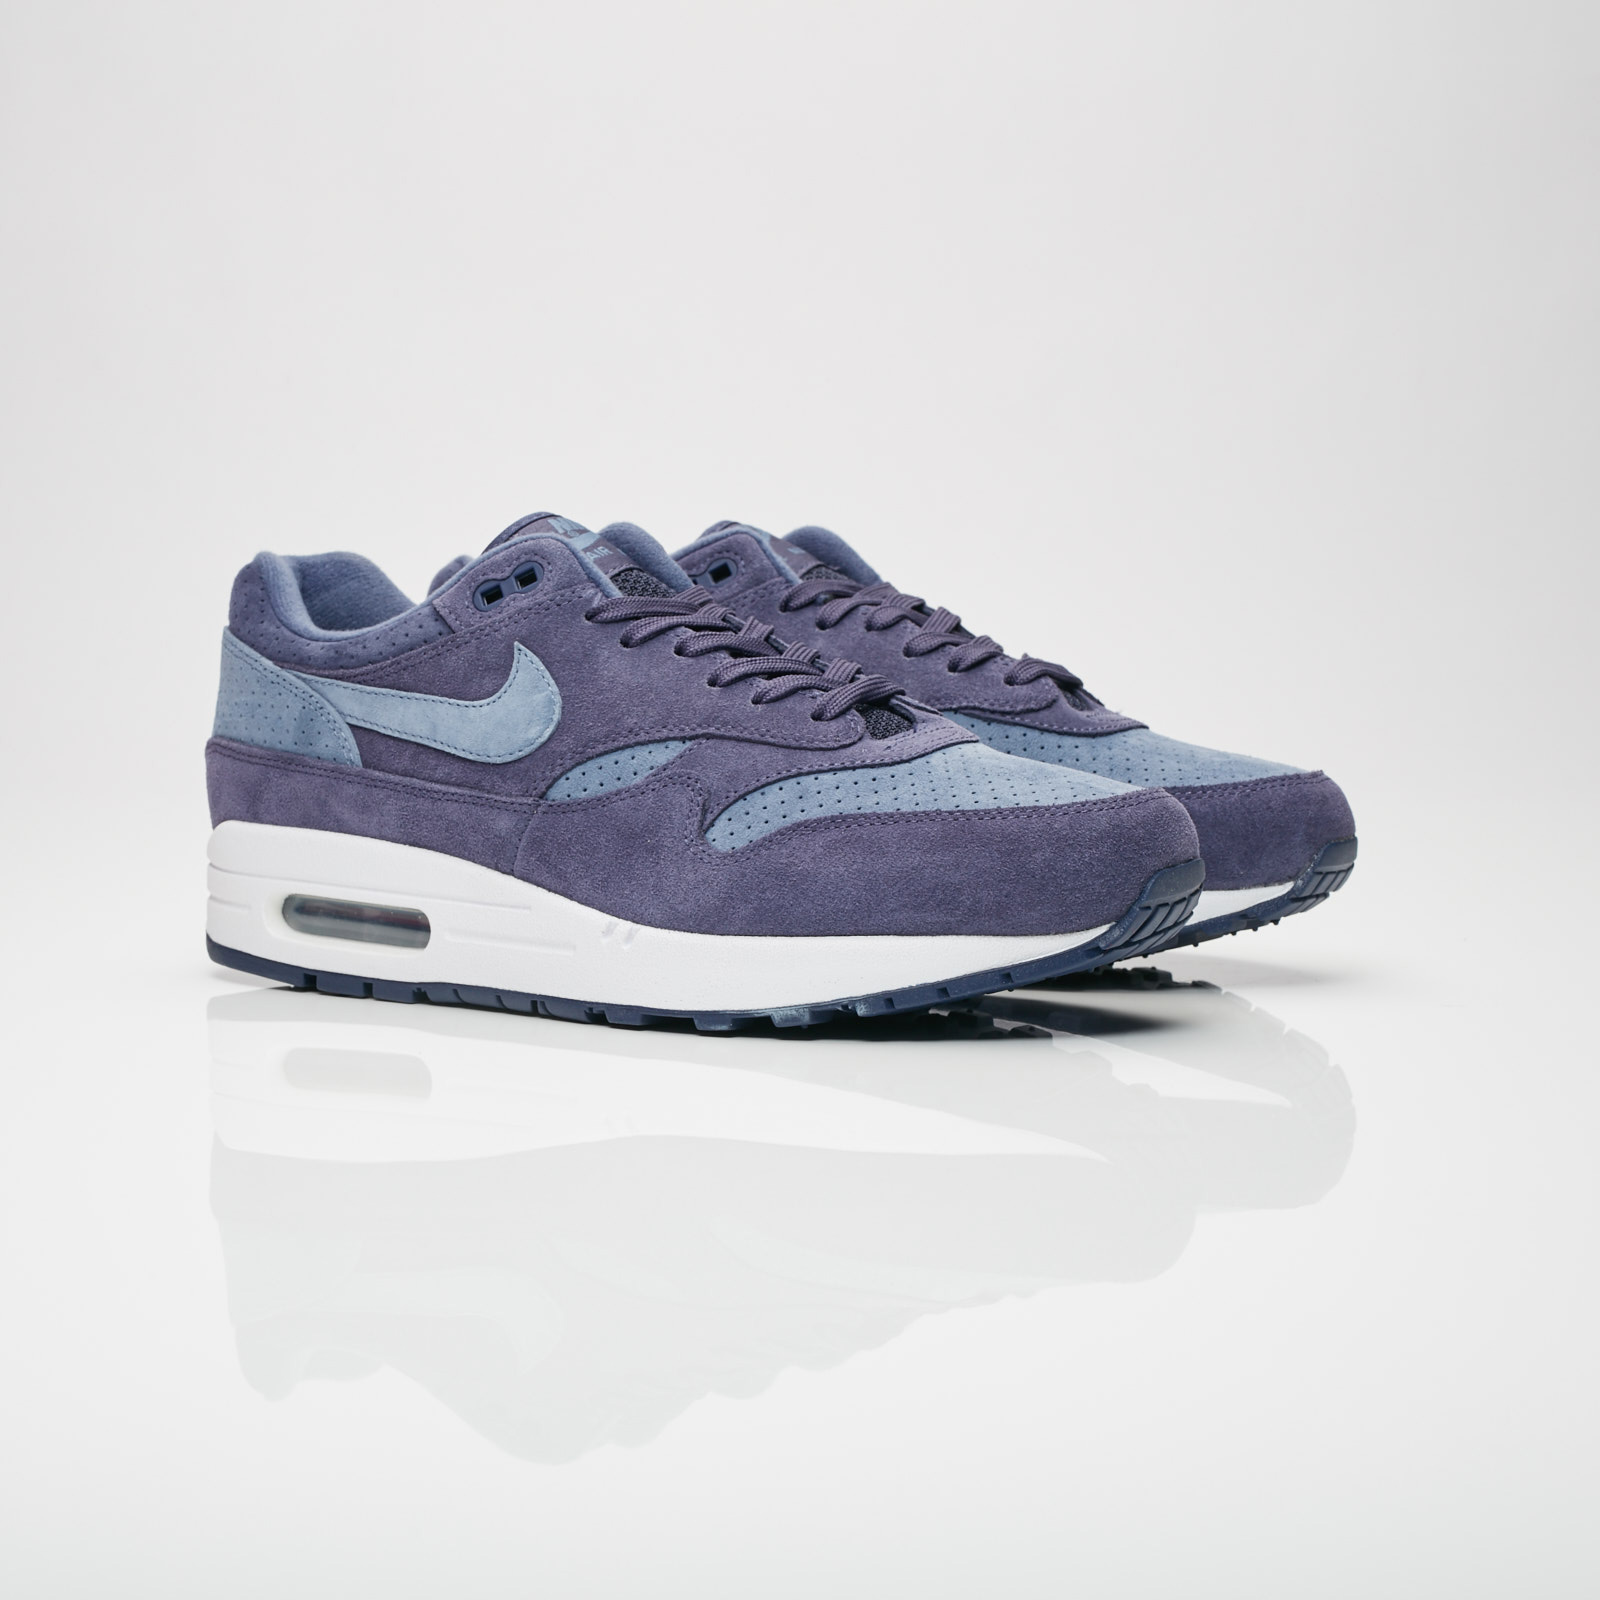 quality design 64ec5 2e229 Nike Sportswear Air Max 1 Premium